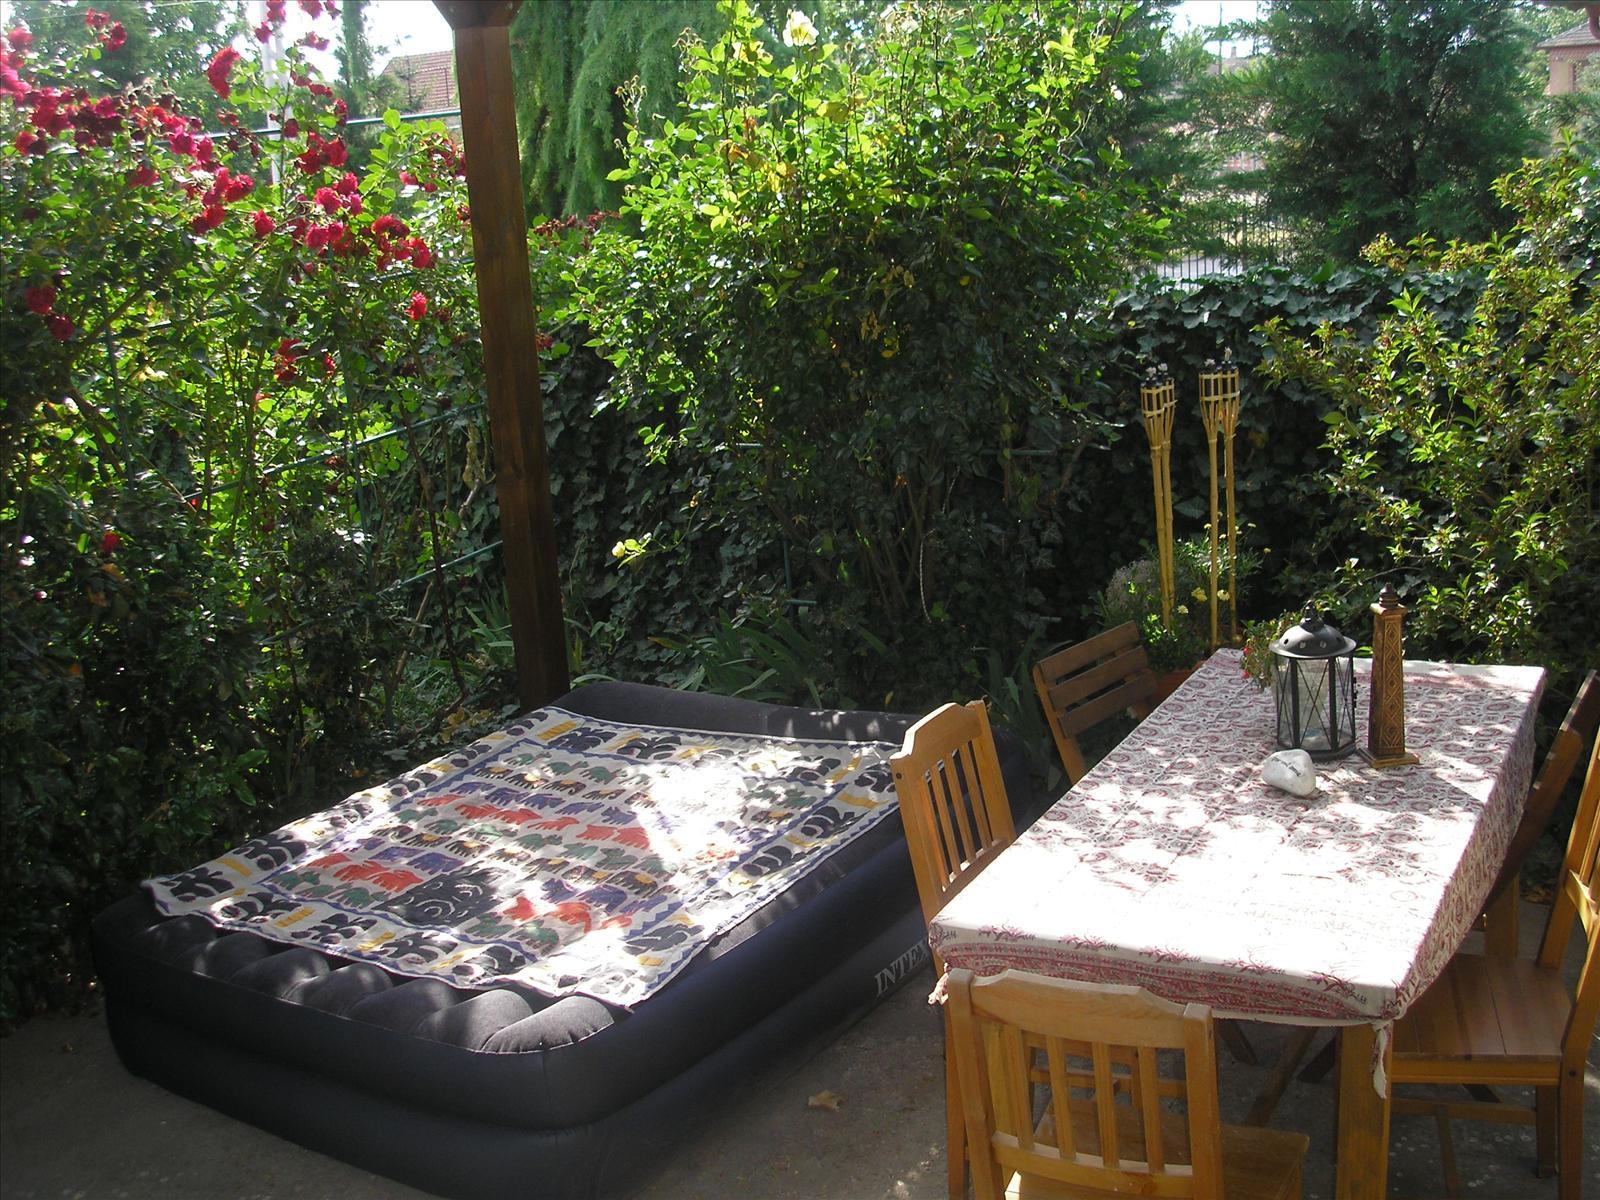 Balkong/altan planering   trädgård   feng shui ifokus